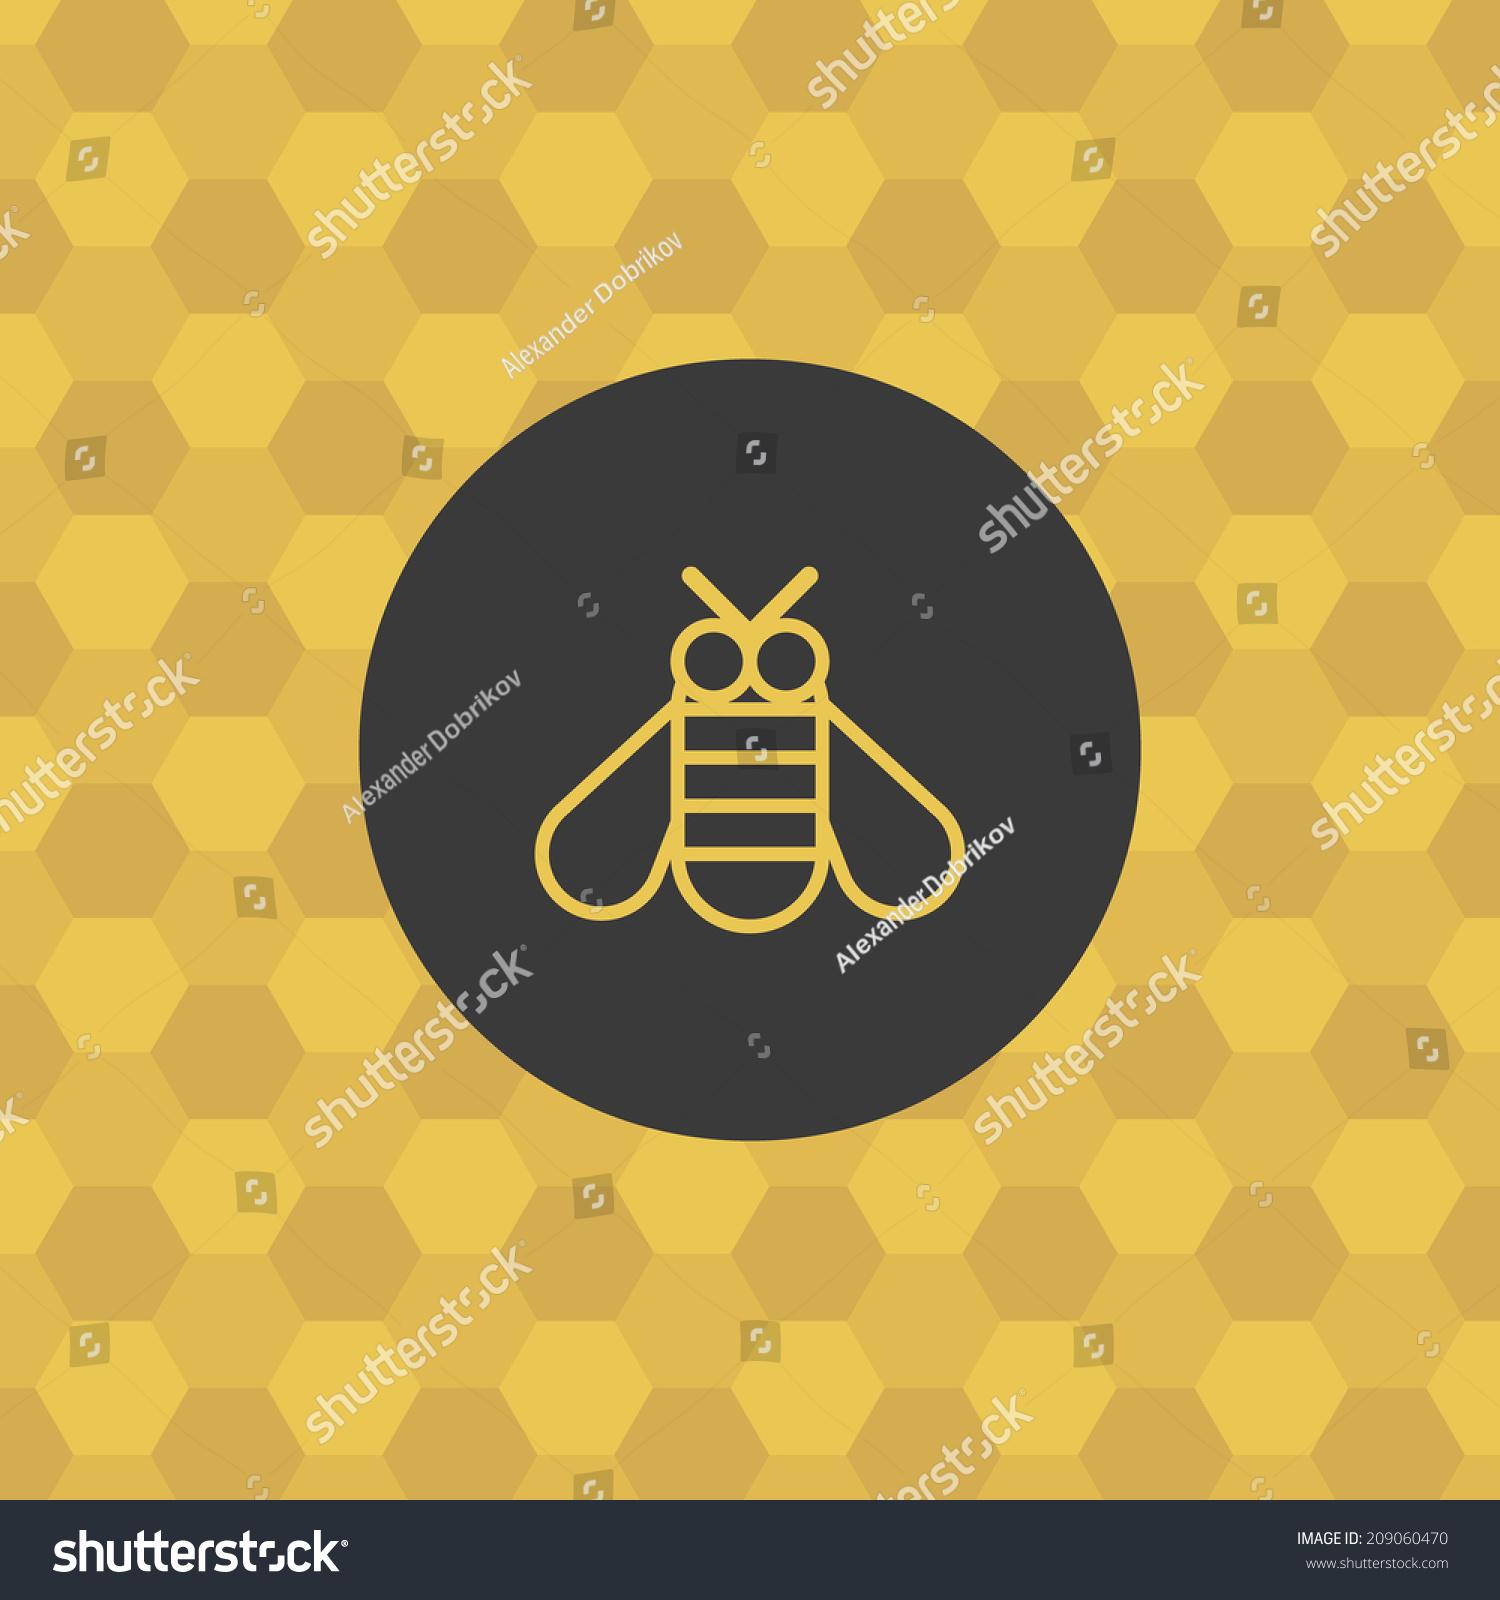 Bee icon honeycomb background bumblebee symbol stock vector bee icon with honeycomb background bumblebee symbol honey theme concept stylized design biocorpaavc